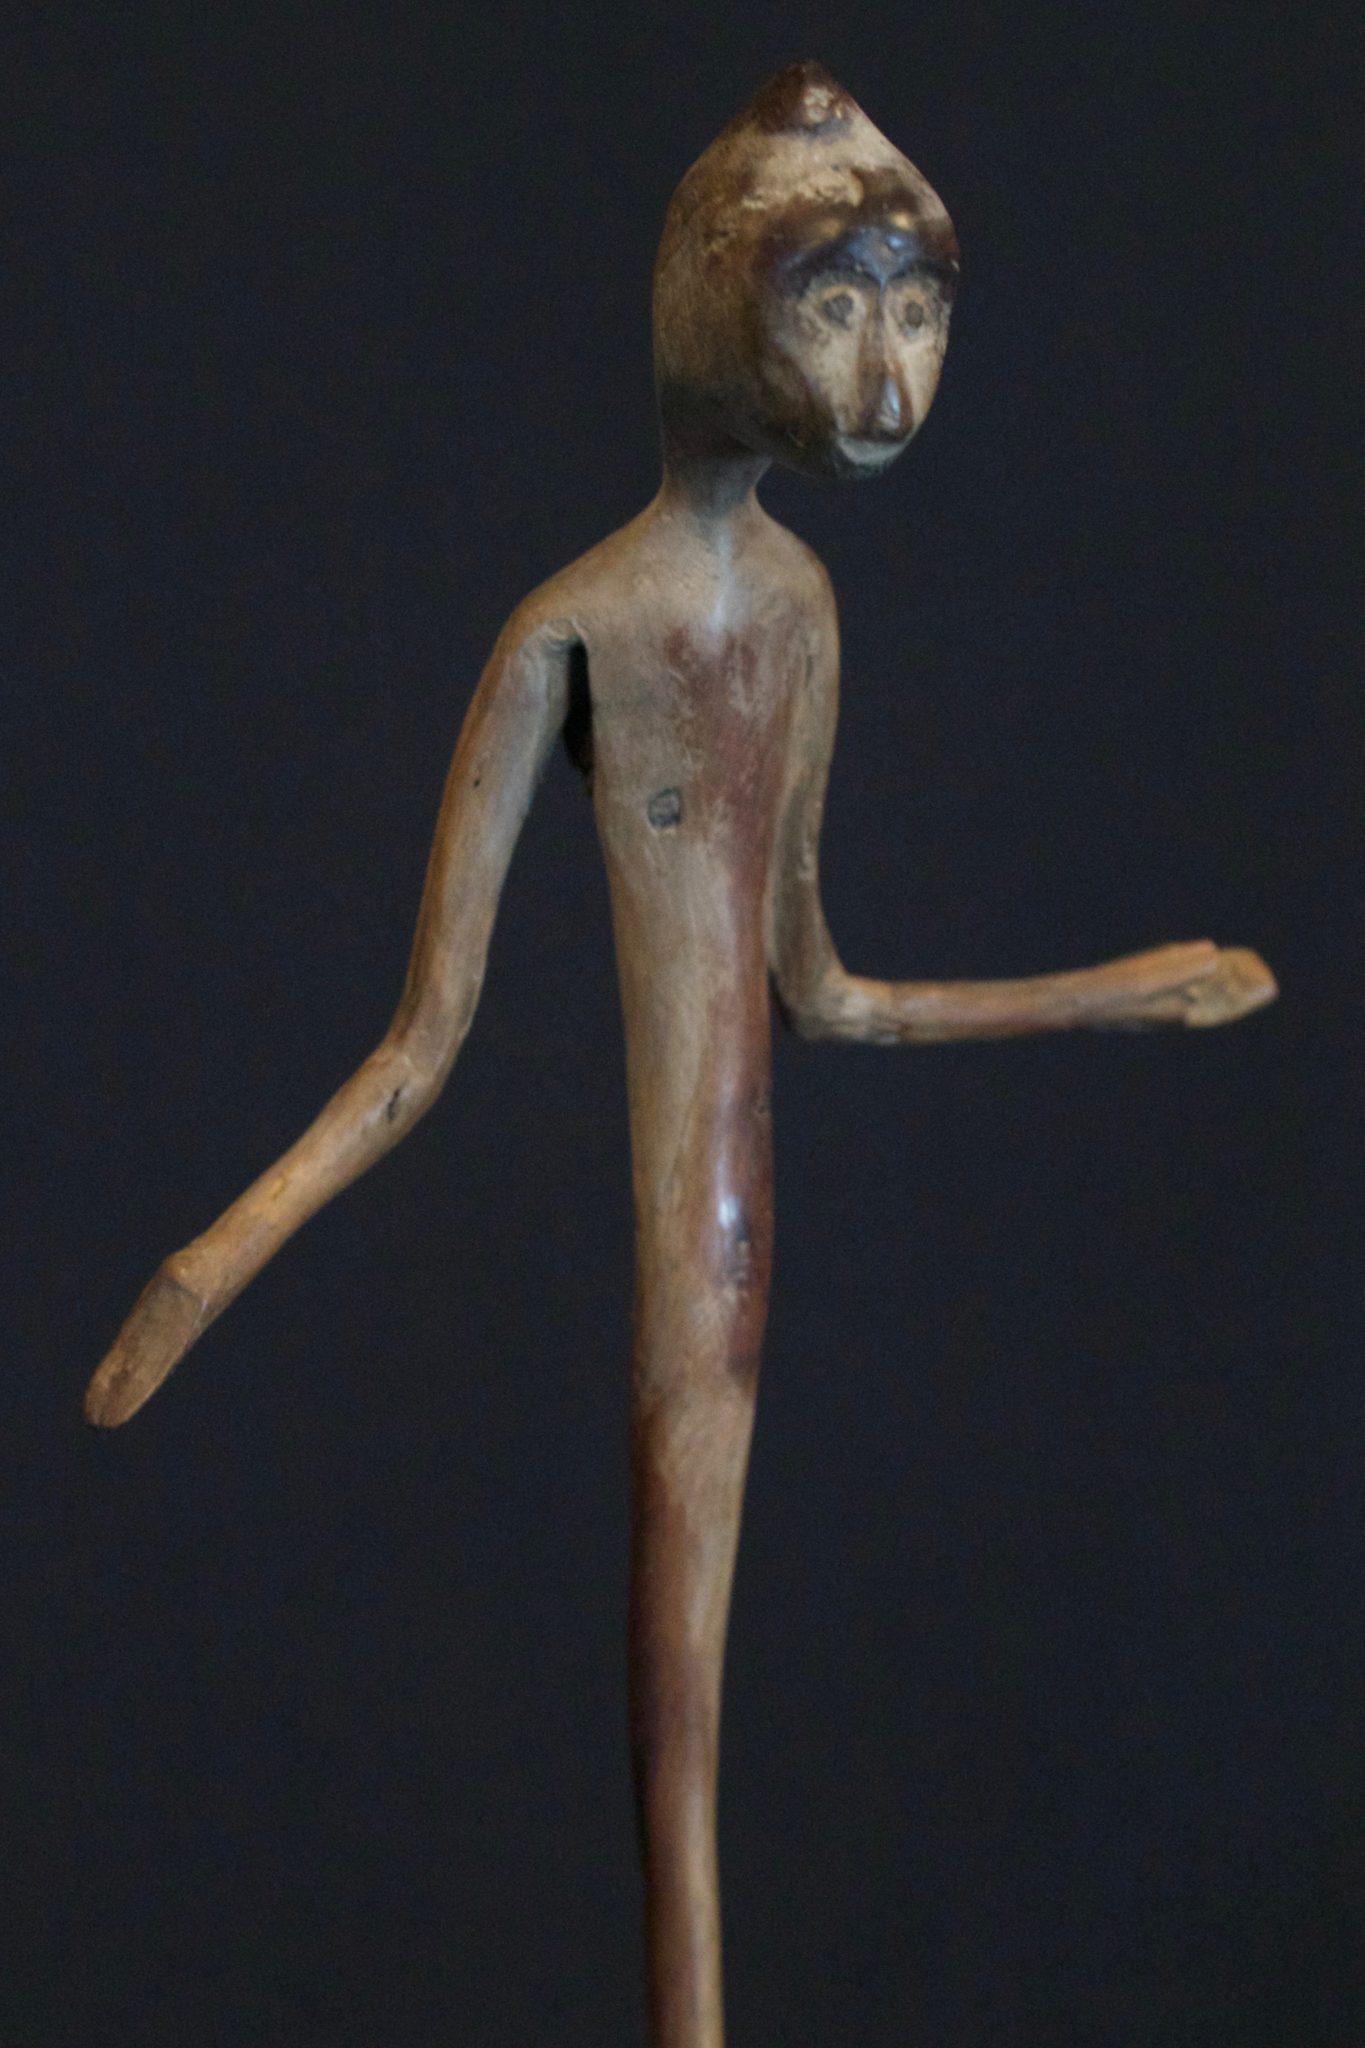 Magic Amulet/Talisman Figure, West Sumba Island, Lesser Sunda Islands, Indonesia, Anakalang village Mid 20th c, Wood Magic amulet used for healing rituals. Sold